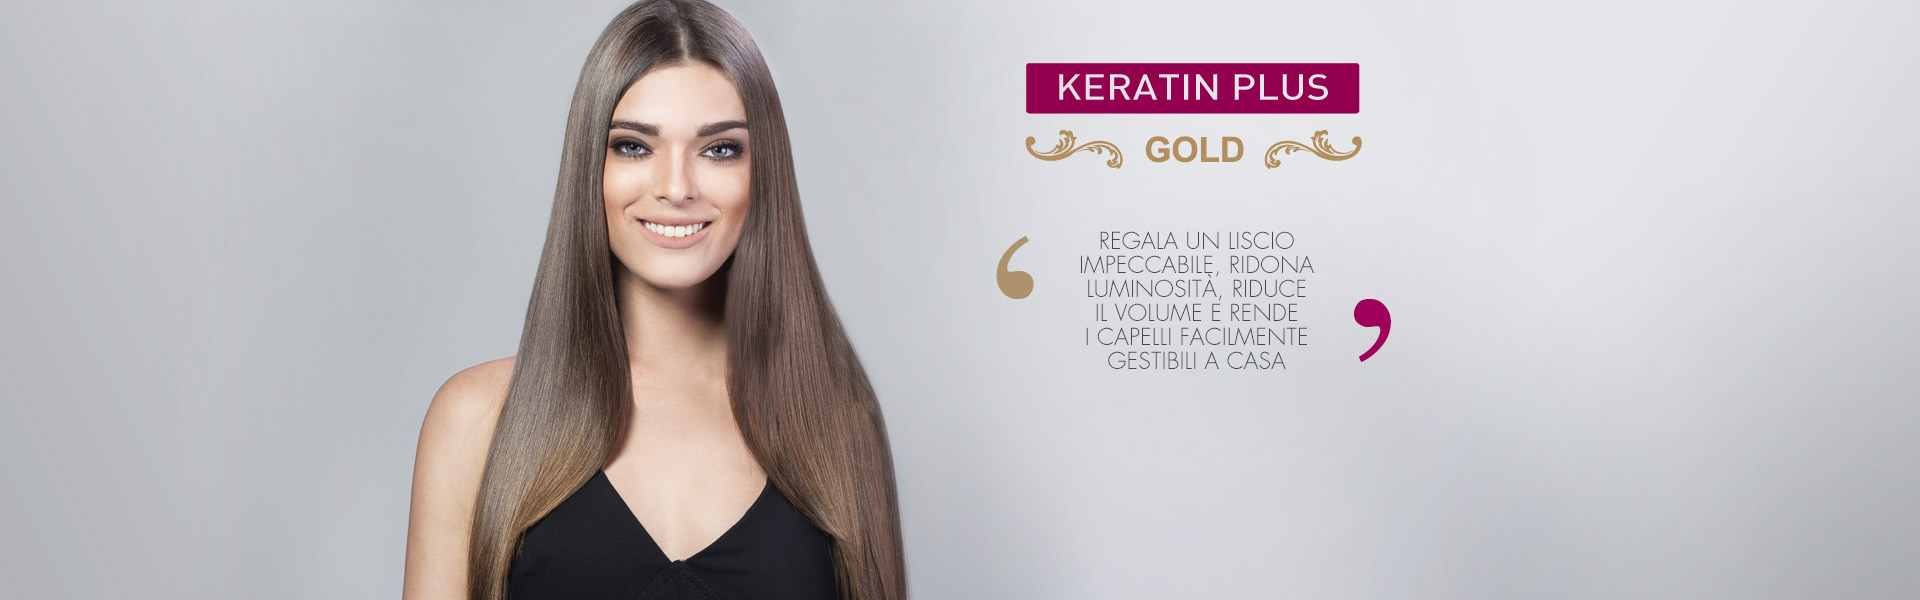 Keratin plus gold lisciante